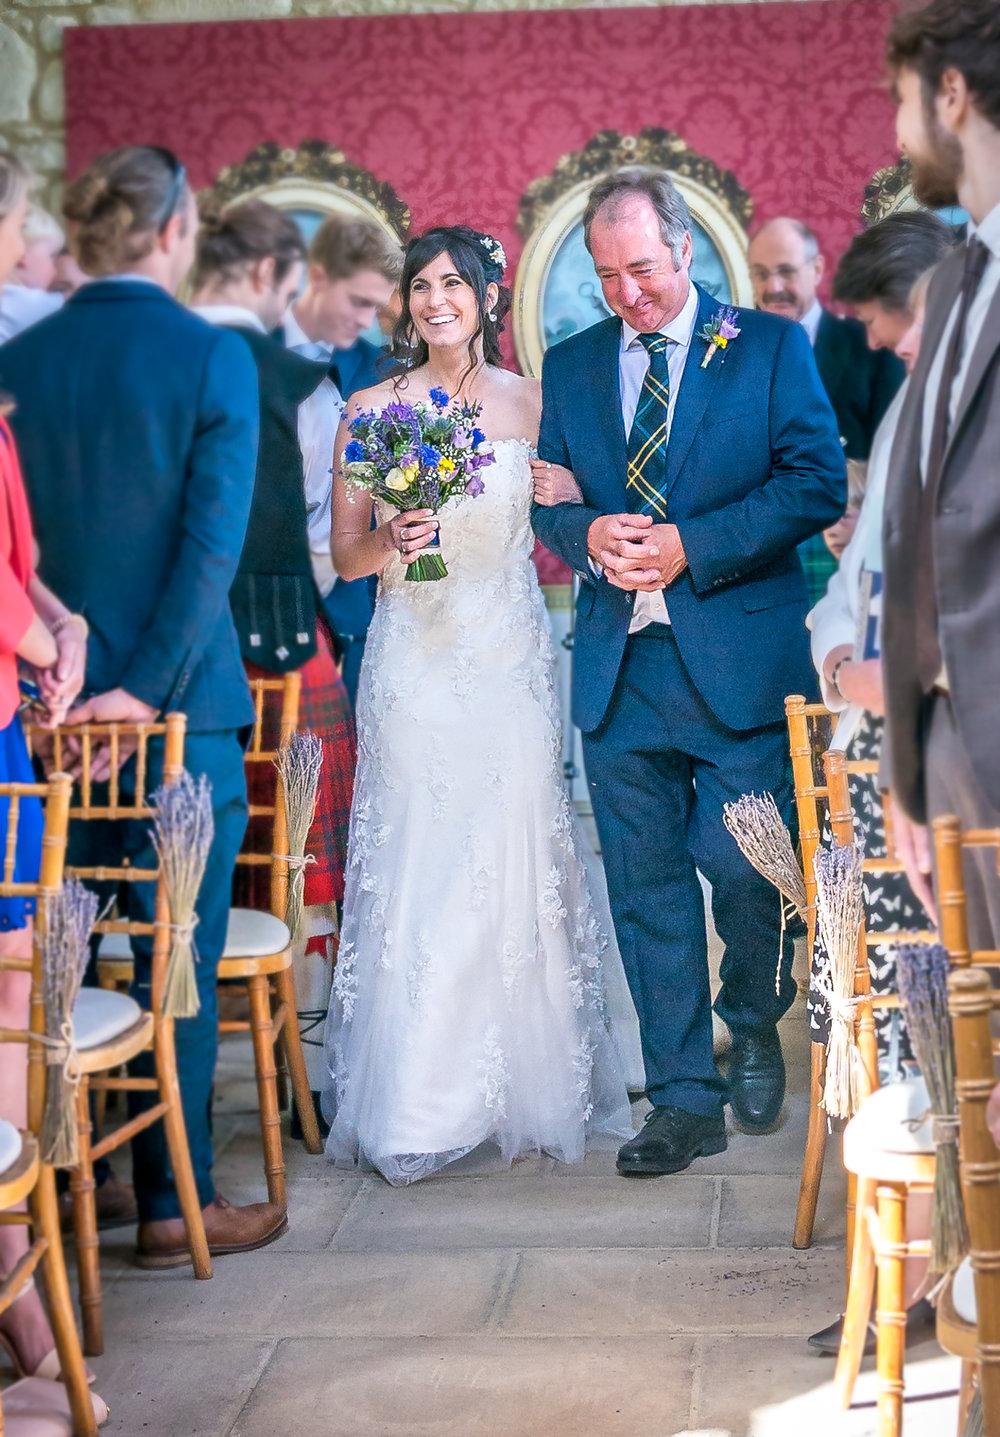 Nat & Pete-June 2017-Ceremony (18 of 60).jpg